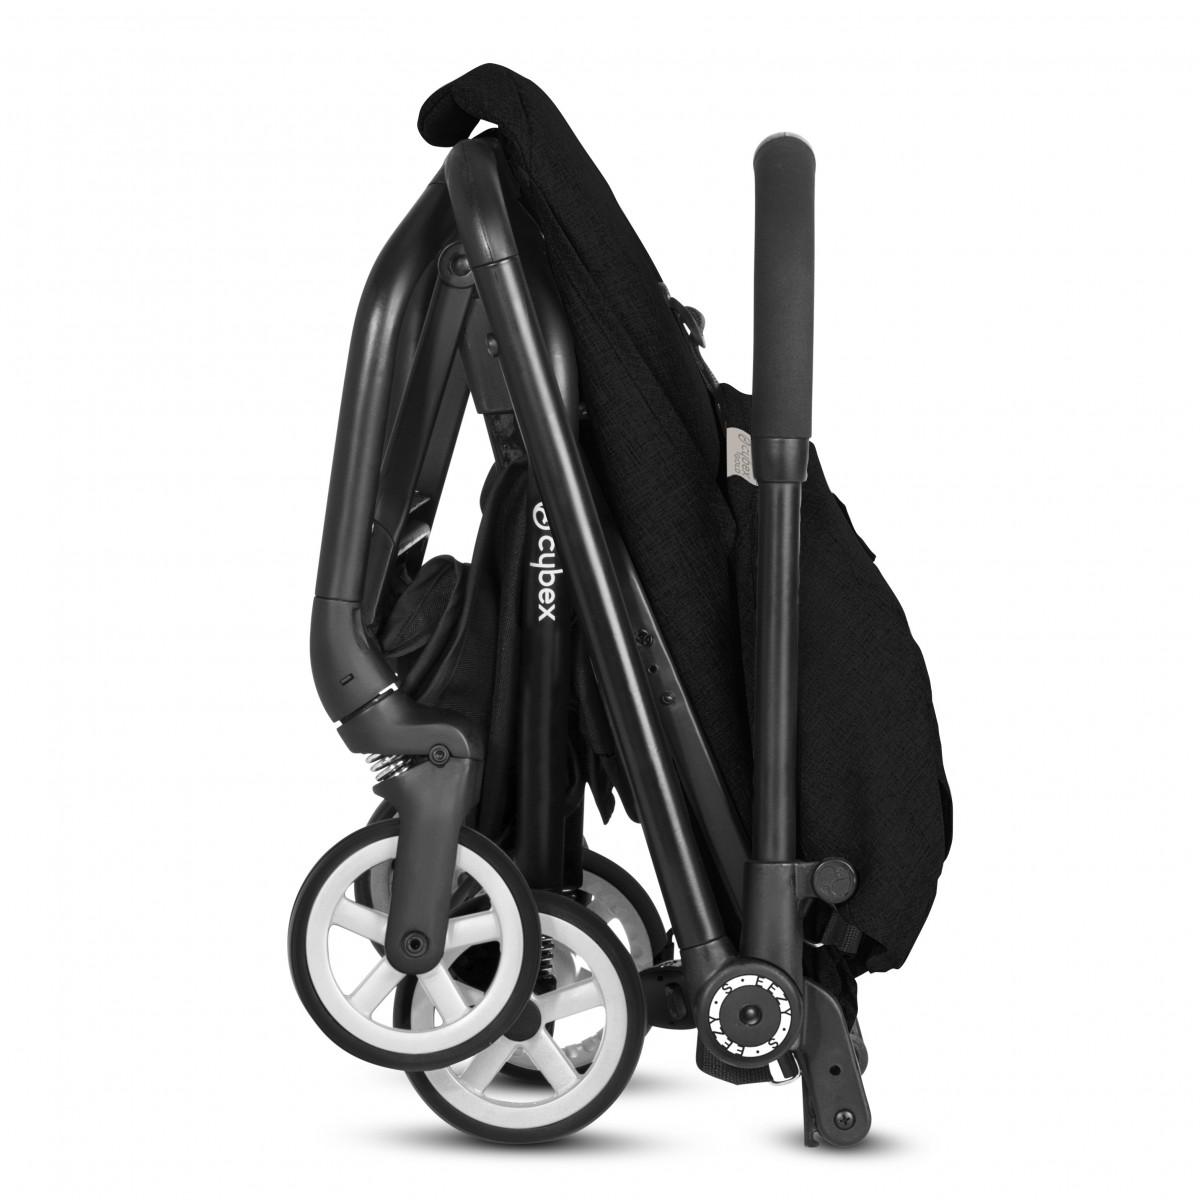 Cybex Eezy S Stroller Lavastone Black Self Standing